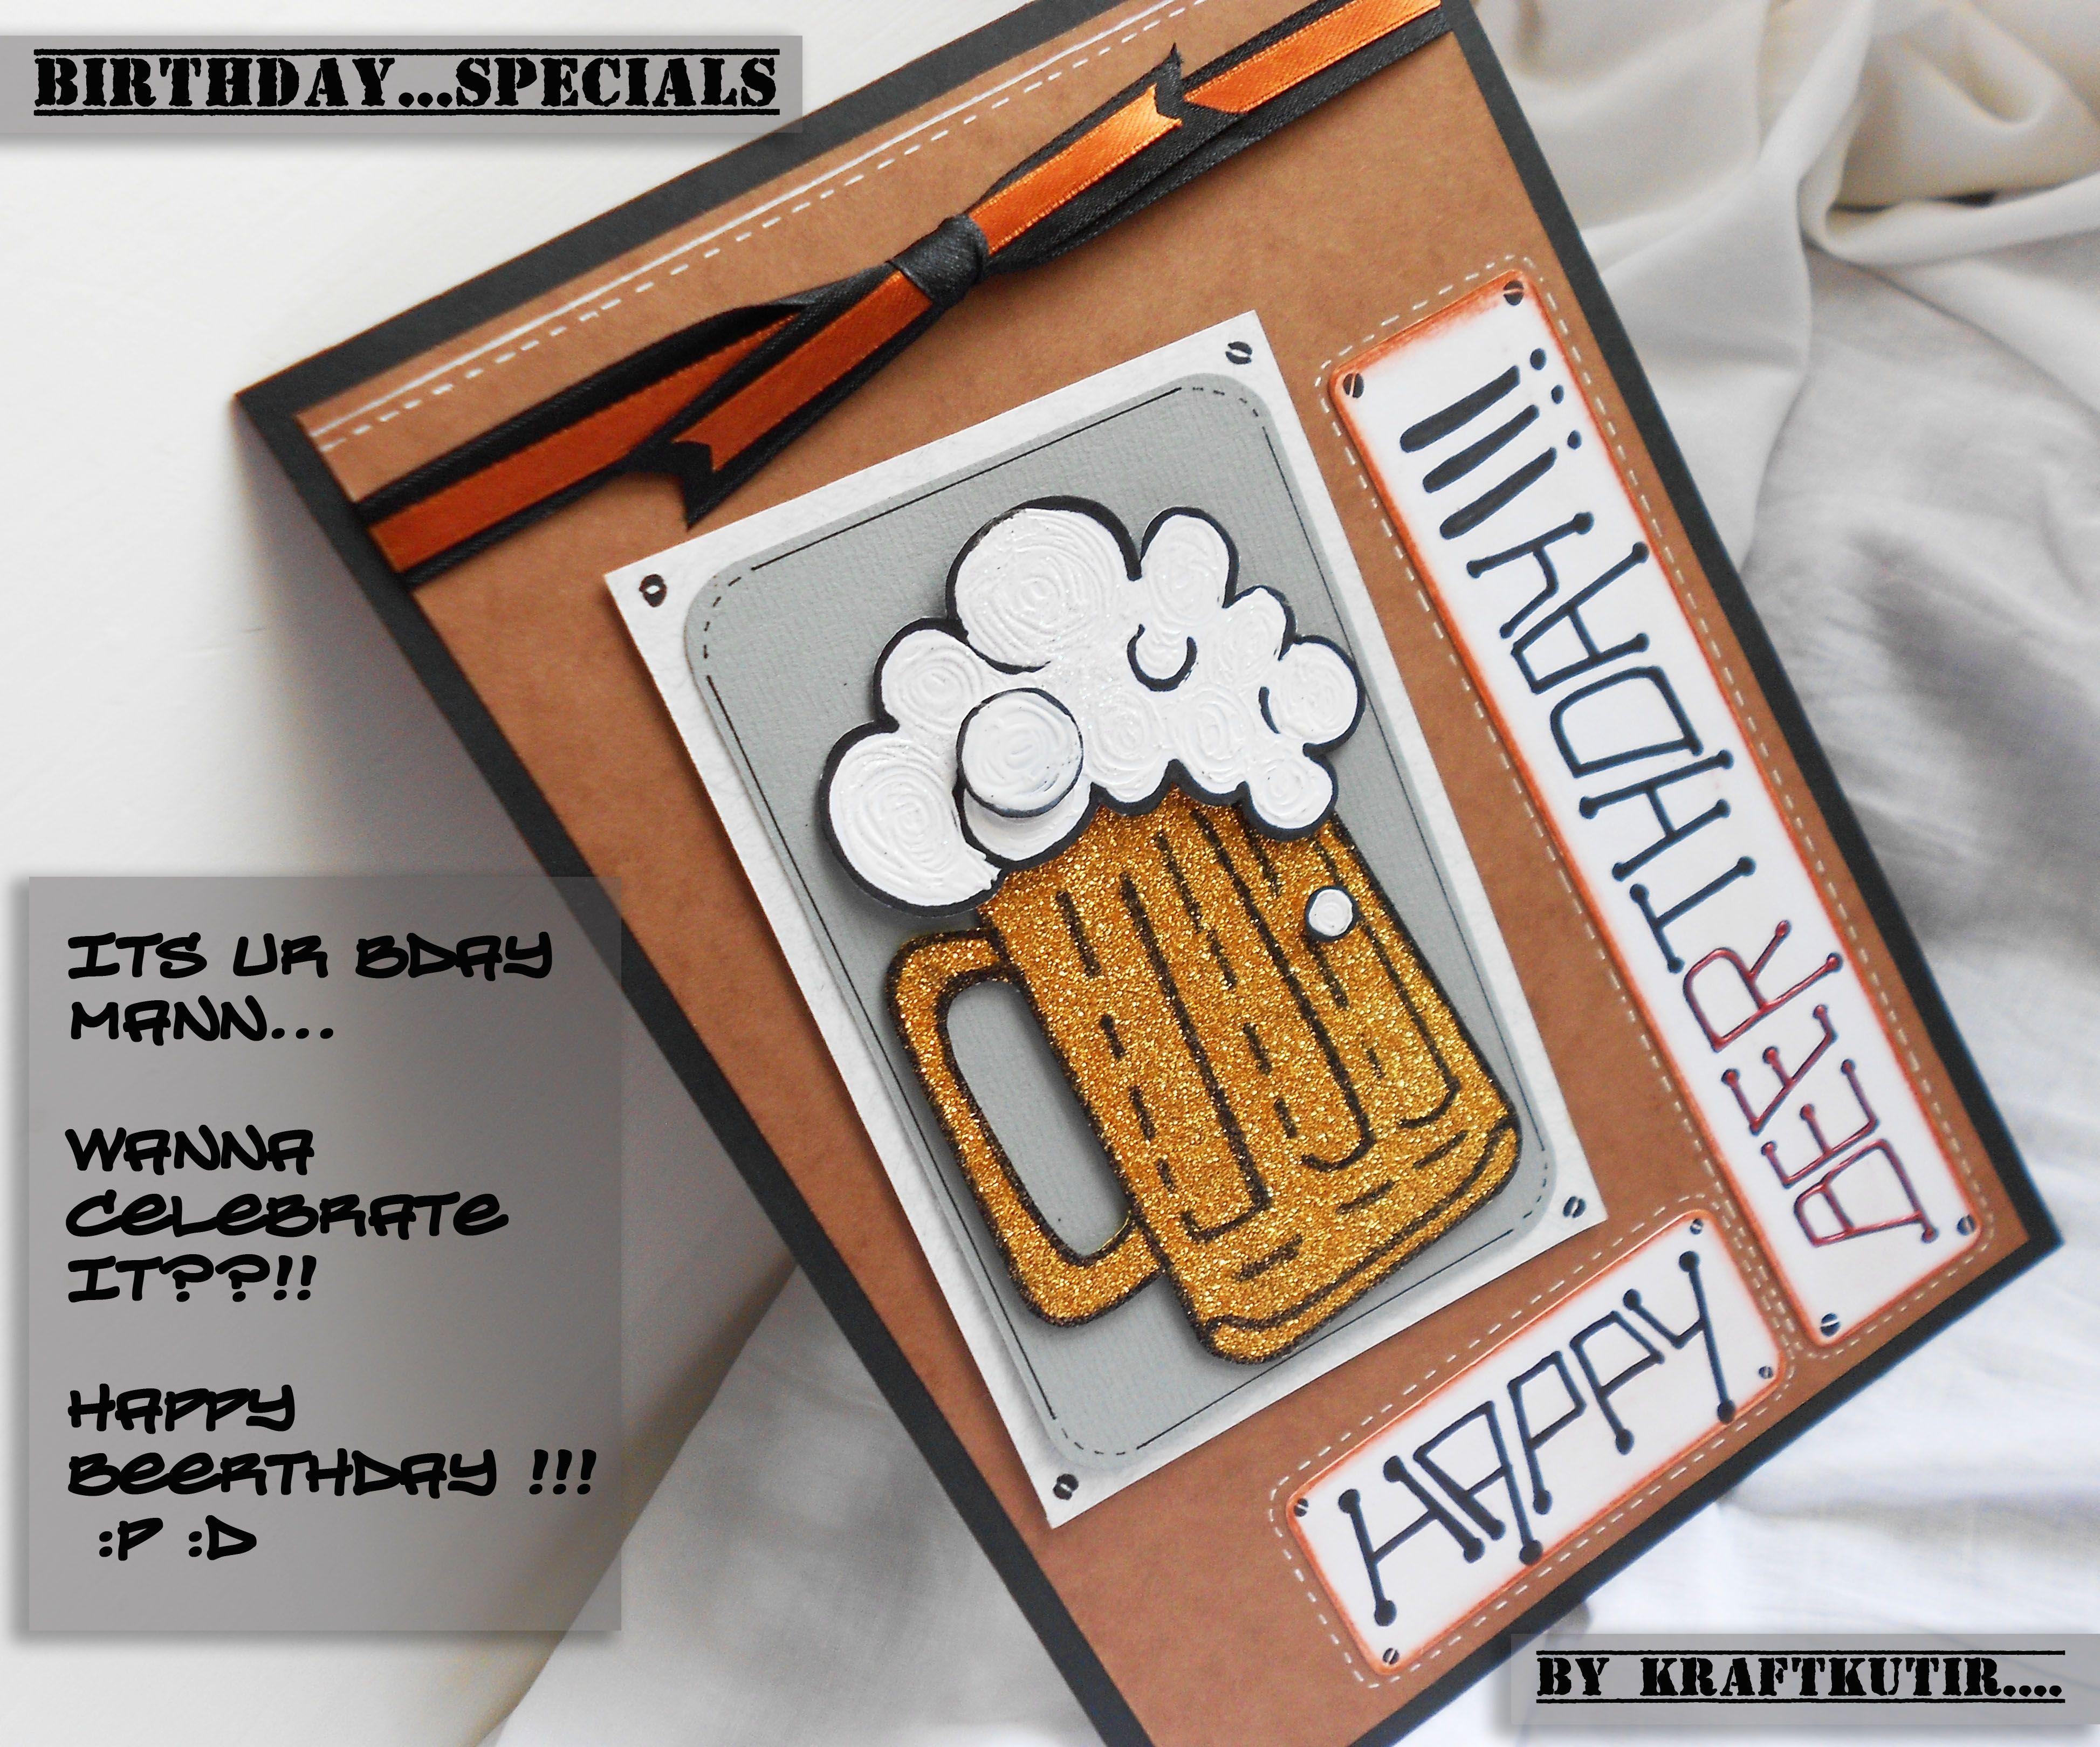 Indian handmade card by krafatkutir beer birthday cards